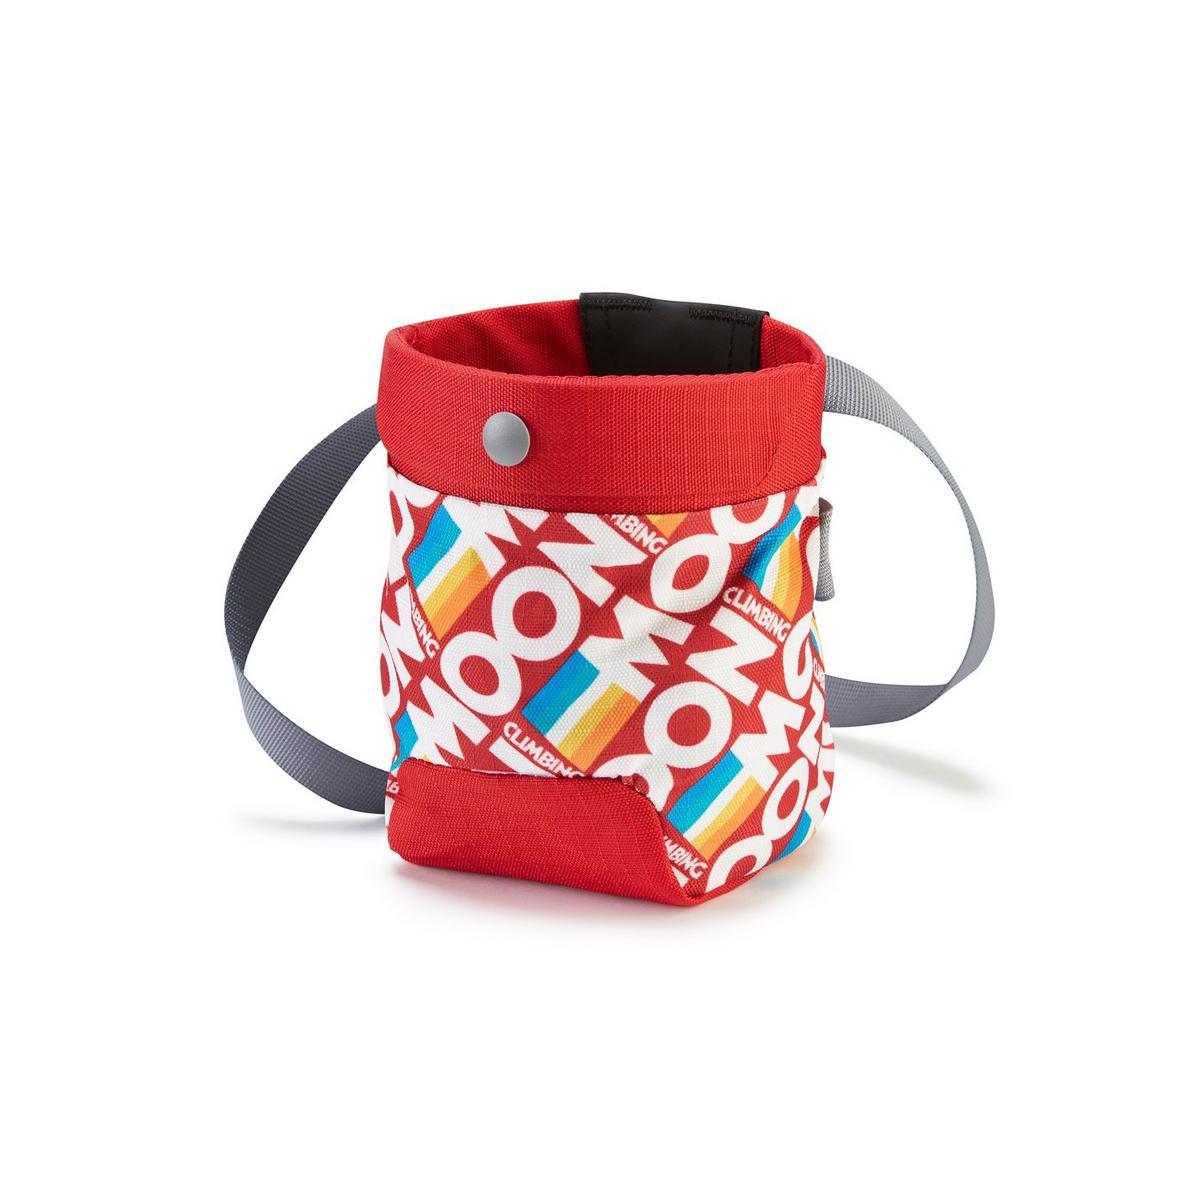 Moon Sport Chalk Bag - Retro Stripe Red